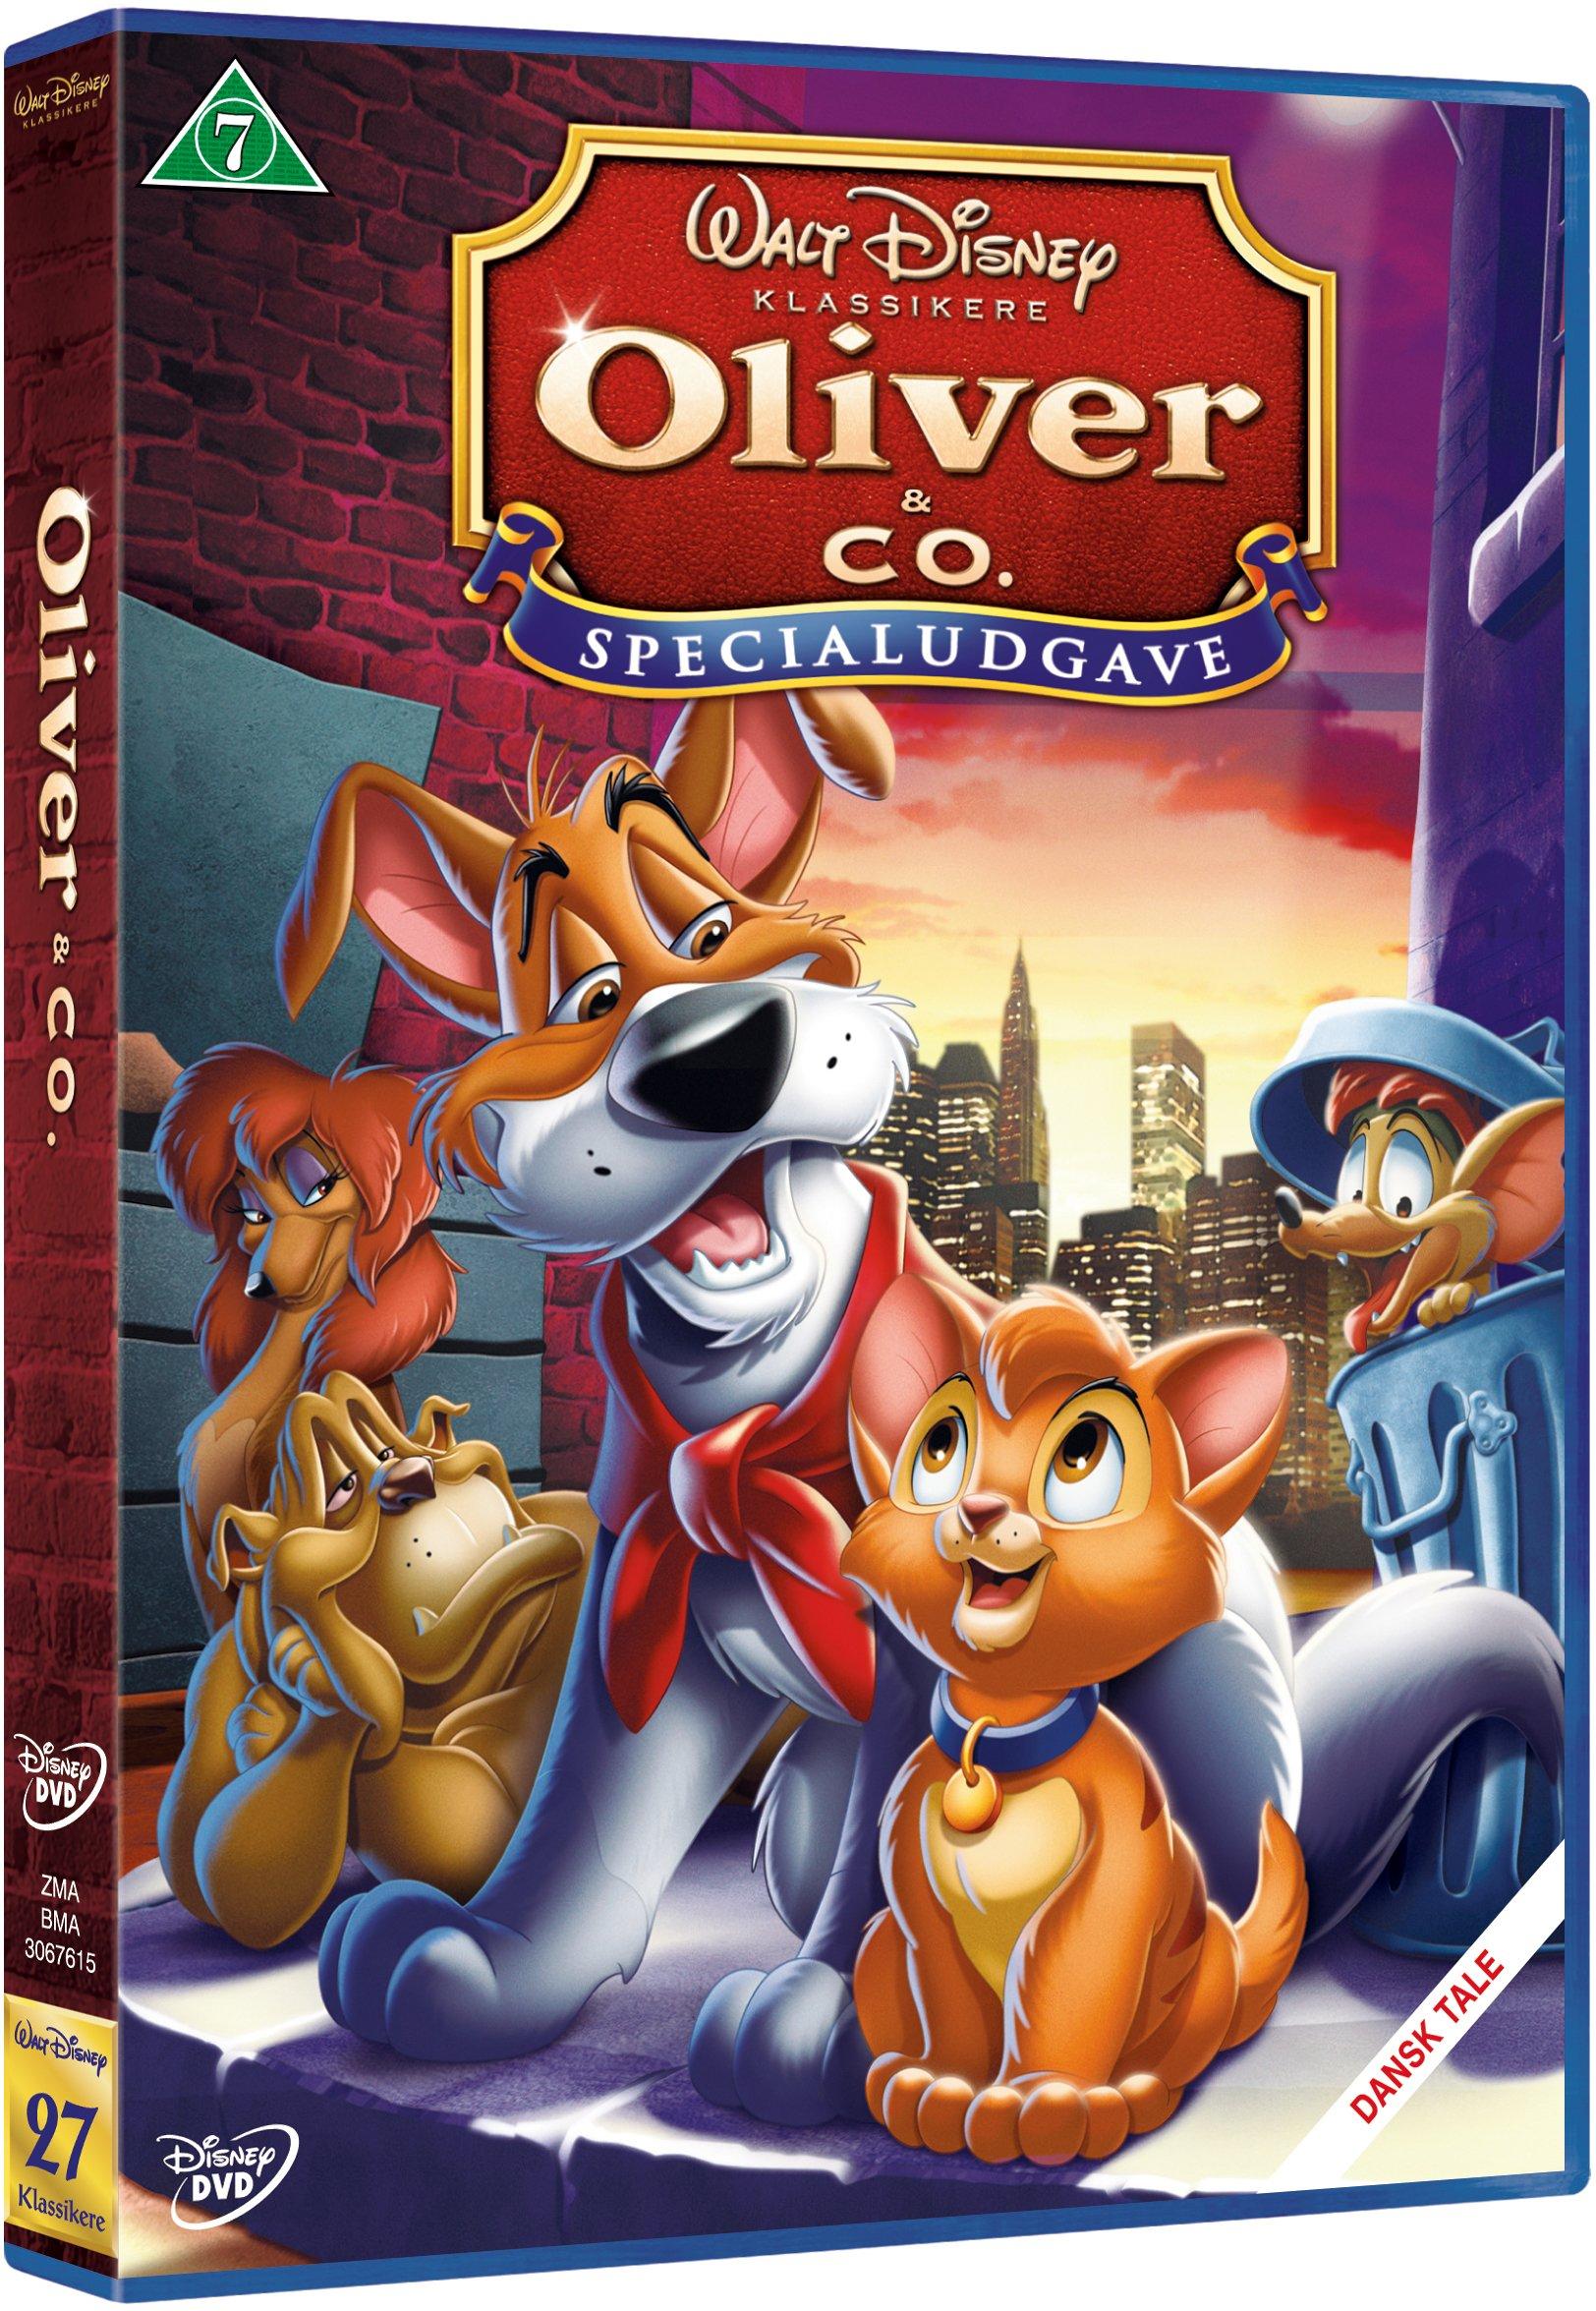 Oliver & Co Disney classic #27